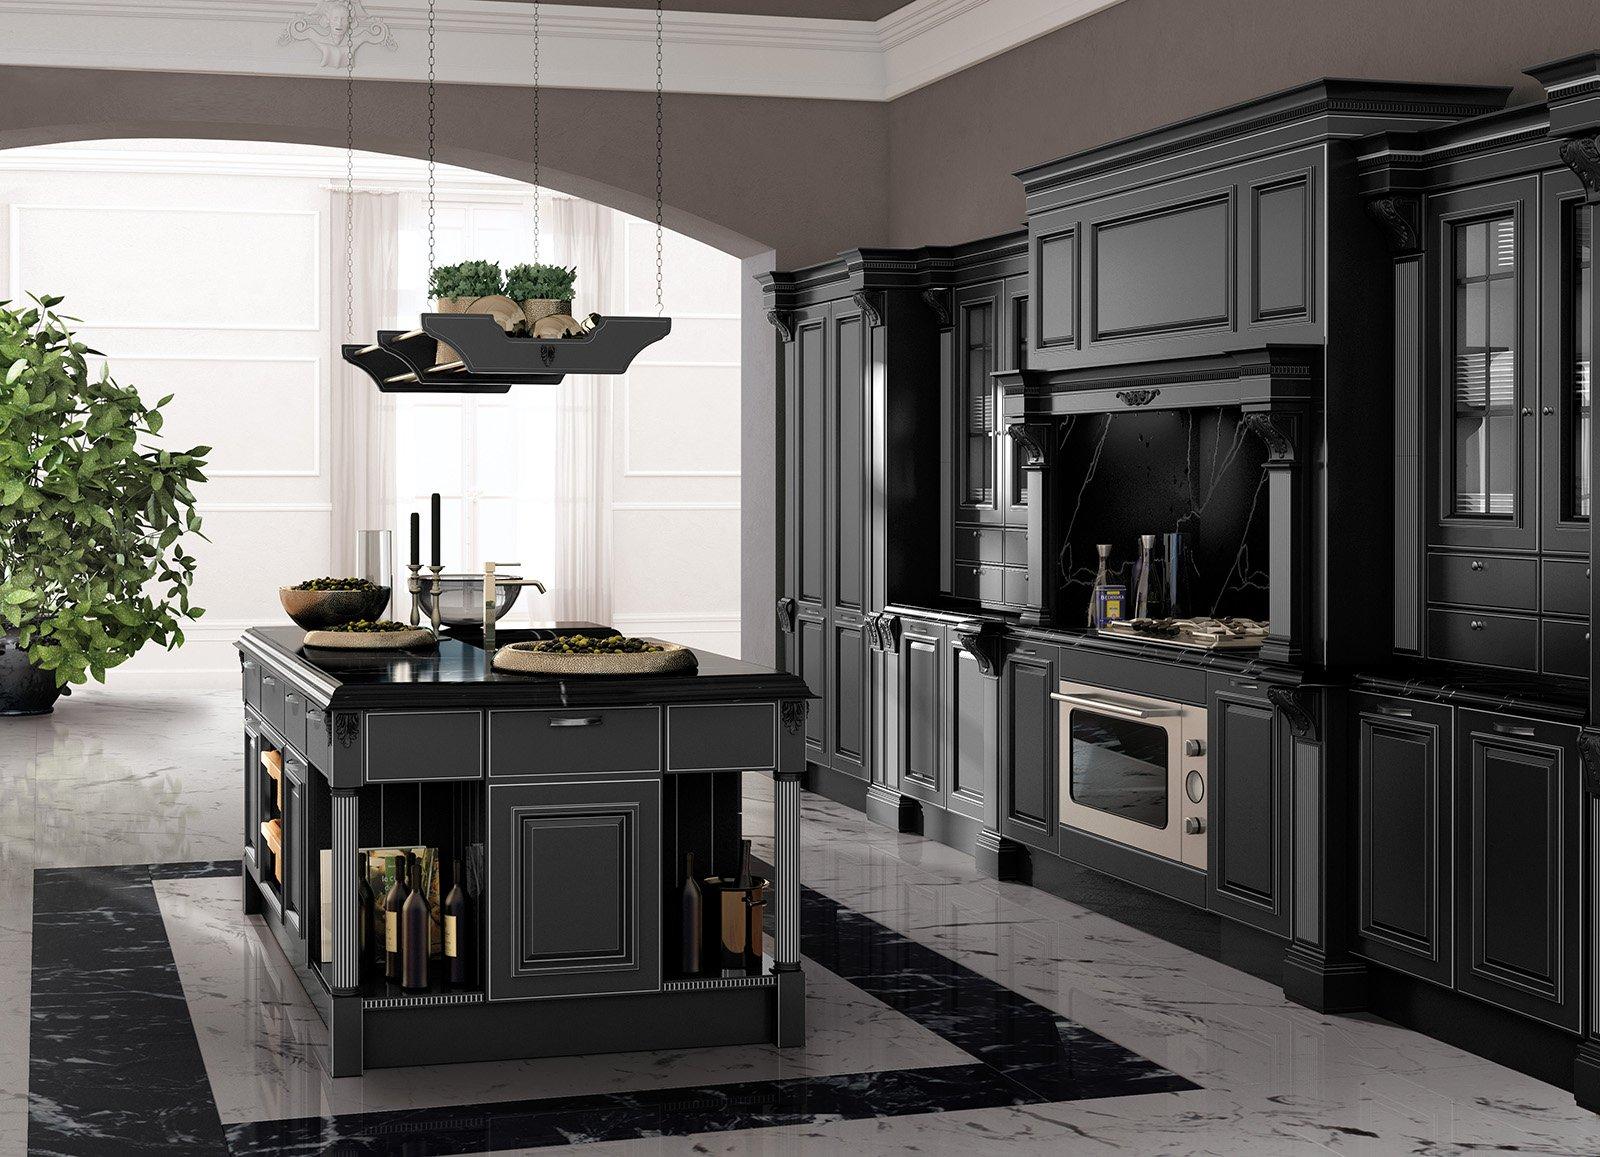 Stunning Cucine Moderne Scure Ideas - ubiquitousforeigner.us ...